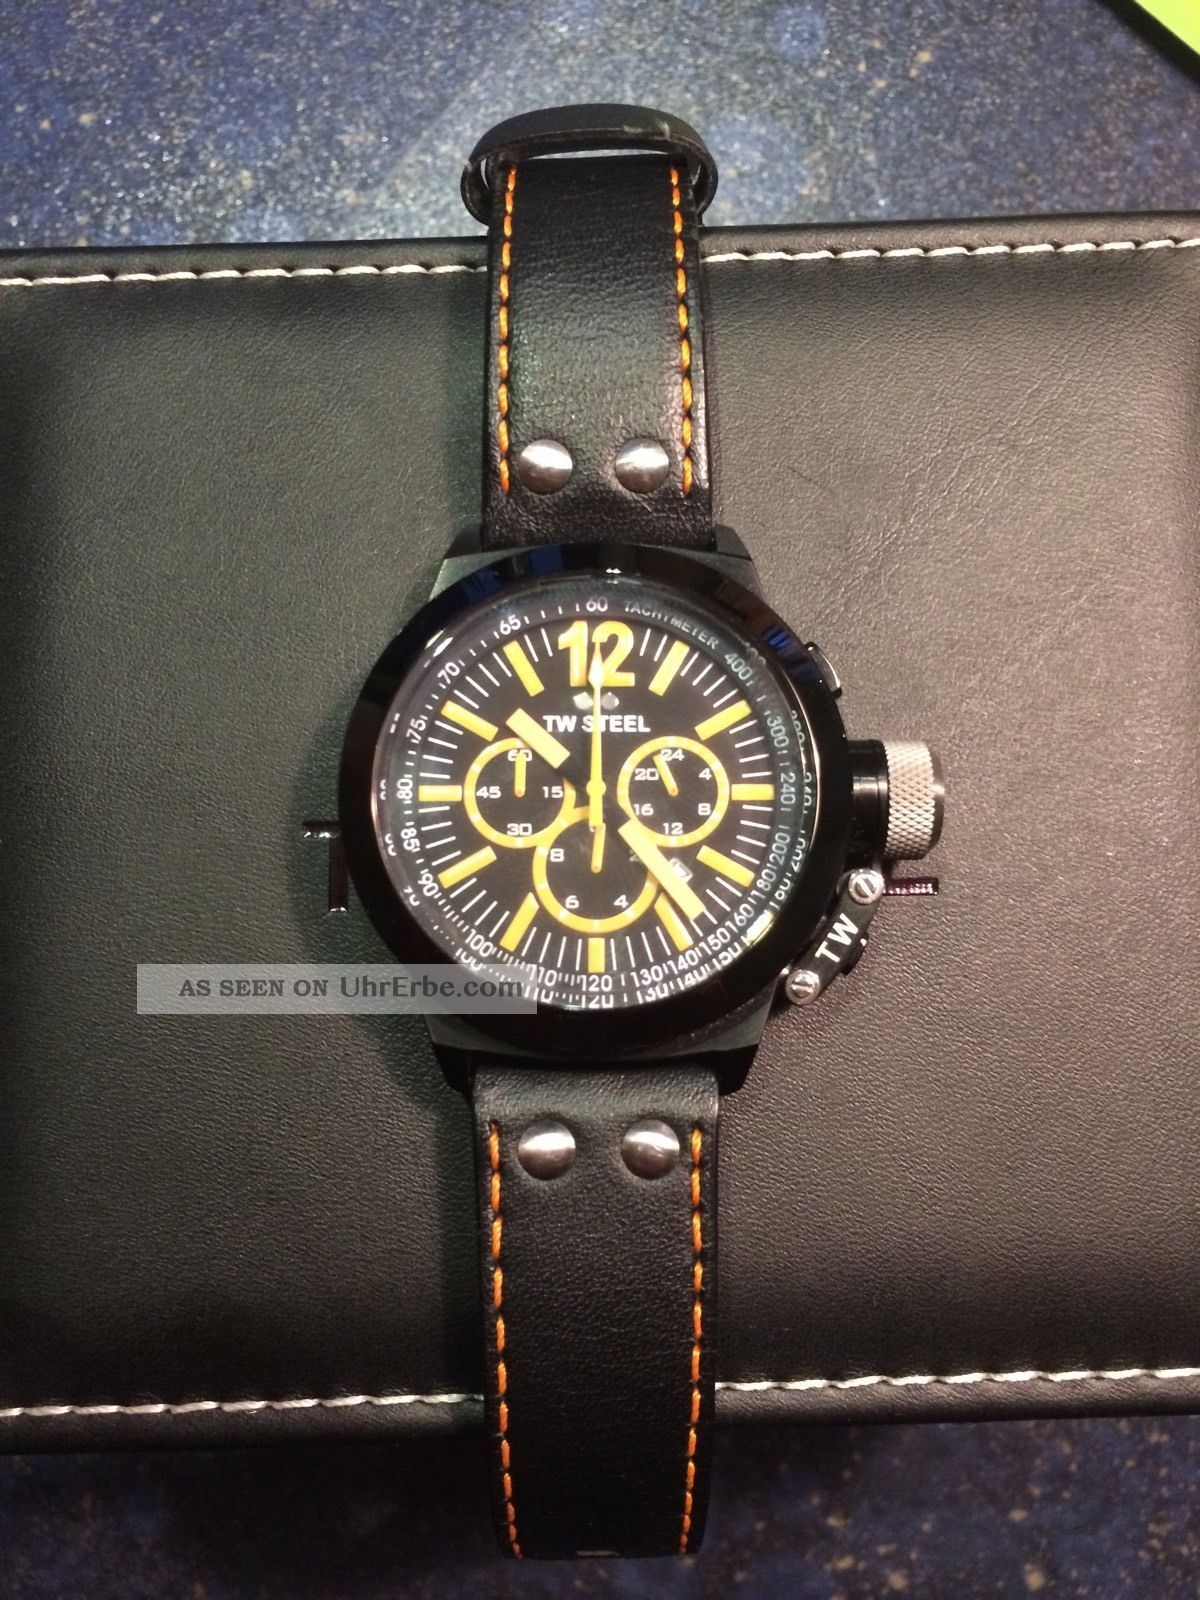 Tw - Steel Armbanduhr Ceo Canteen Twce 1029 - Fast Unbenutzt - Komplett Mit Box - Armbanduhren Bild